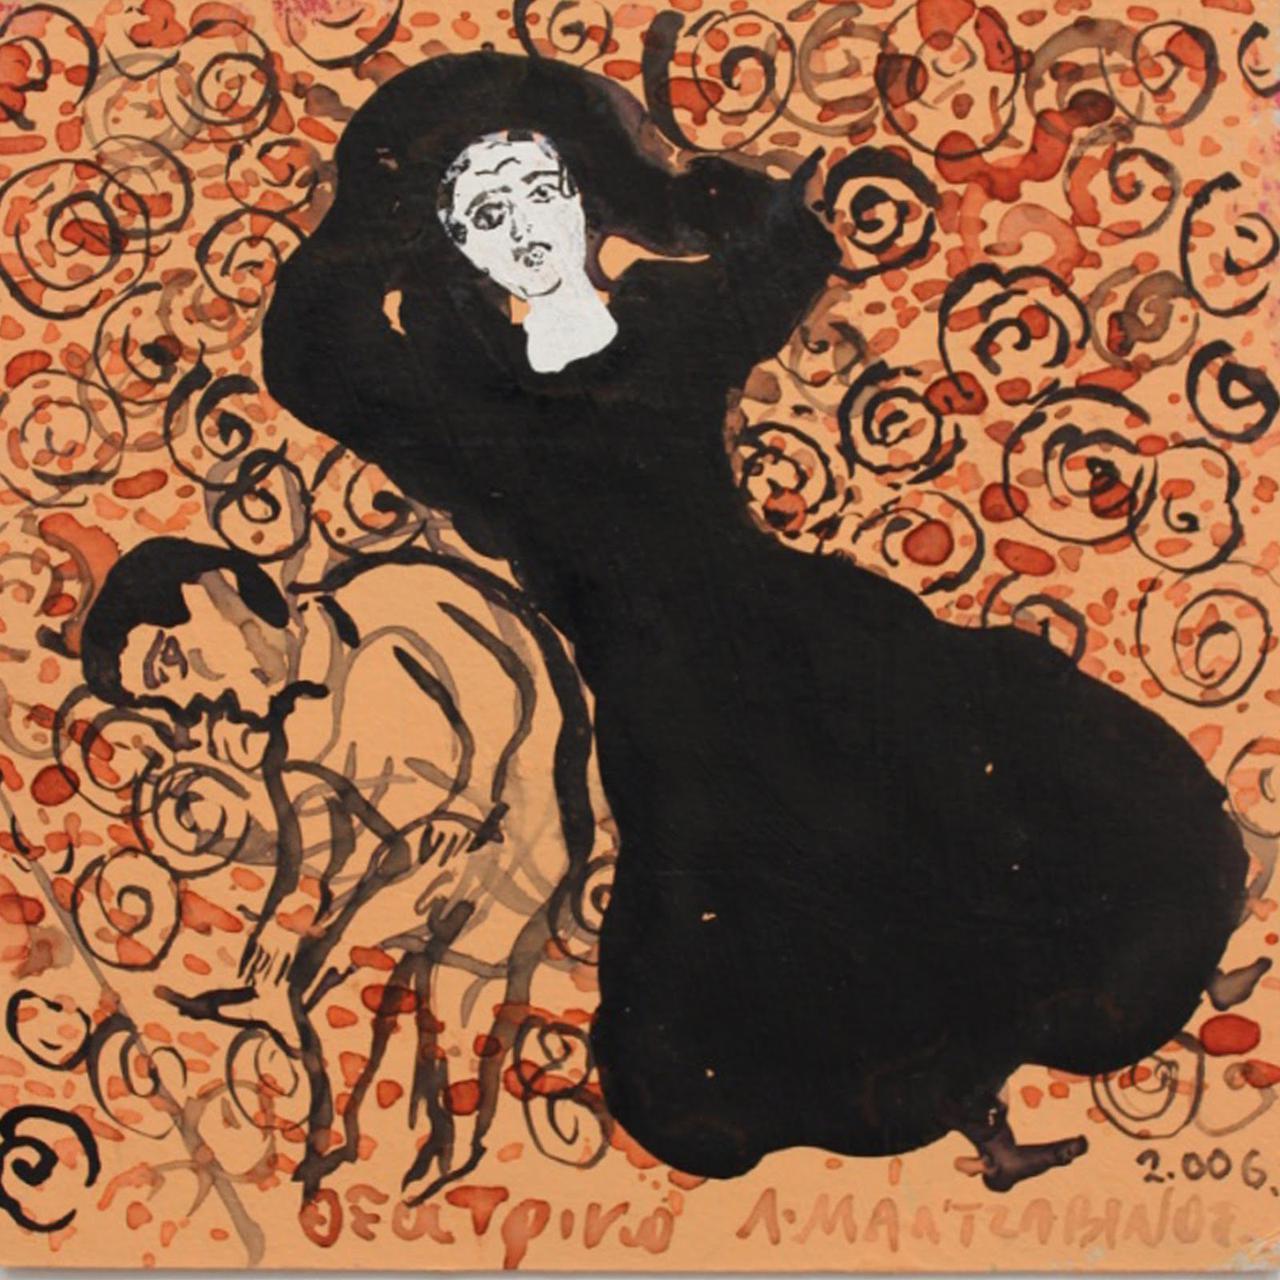 Tassos Mantzavinos, Theater, watercolours & ink, 15 x 15 cm (each), 2006